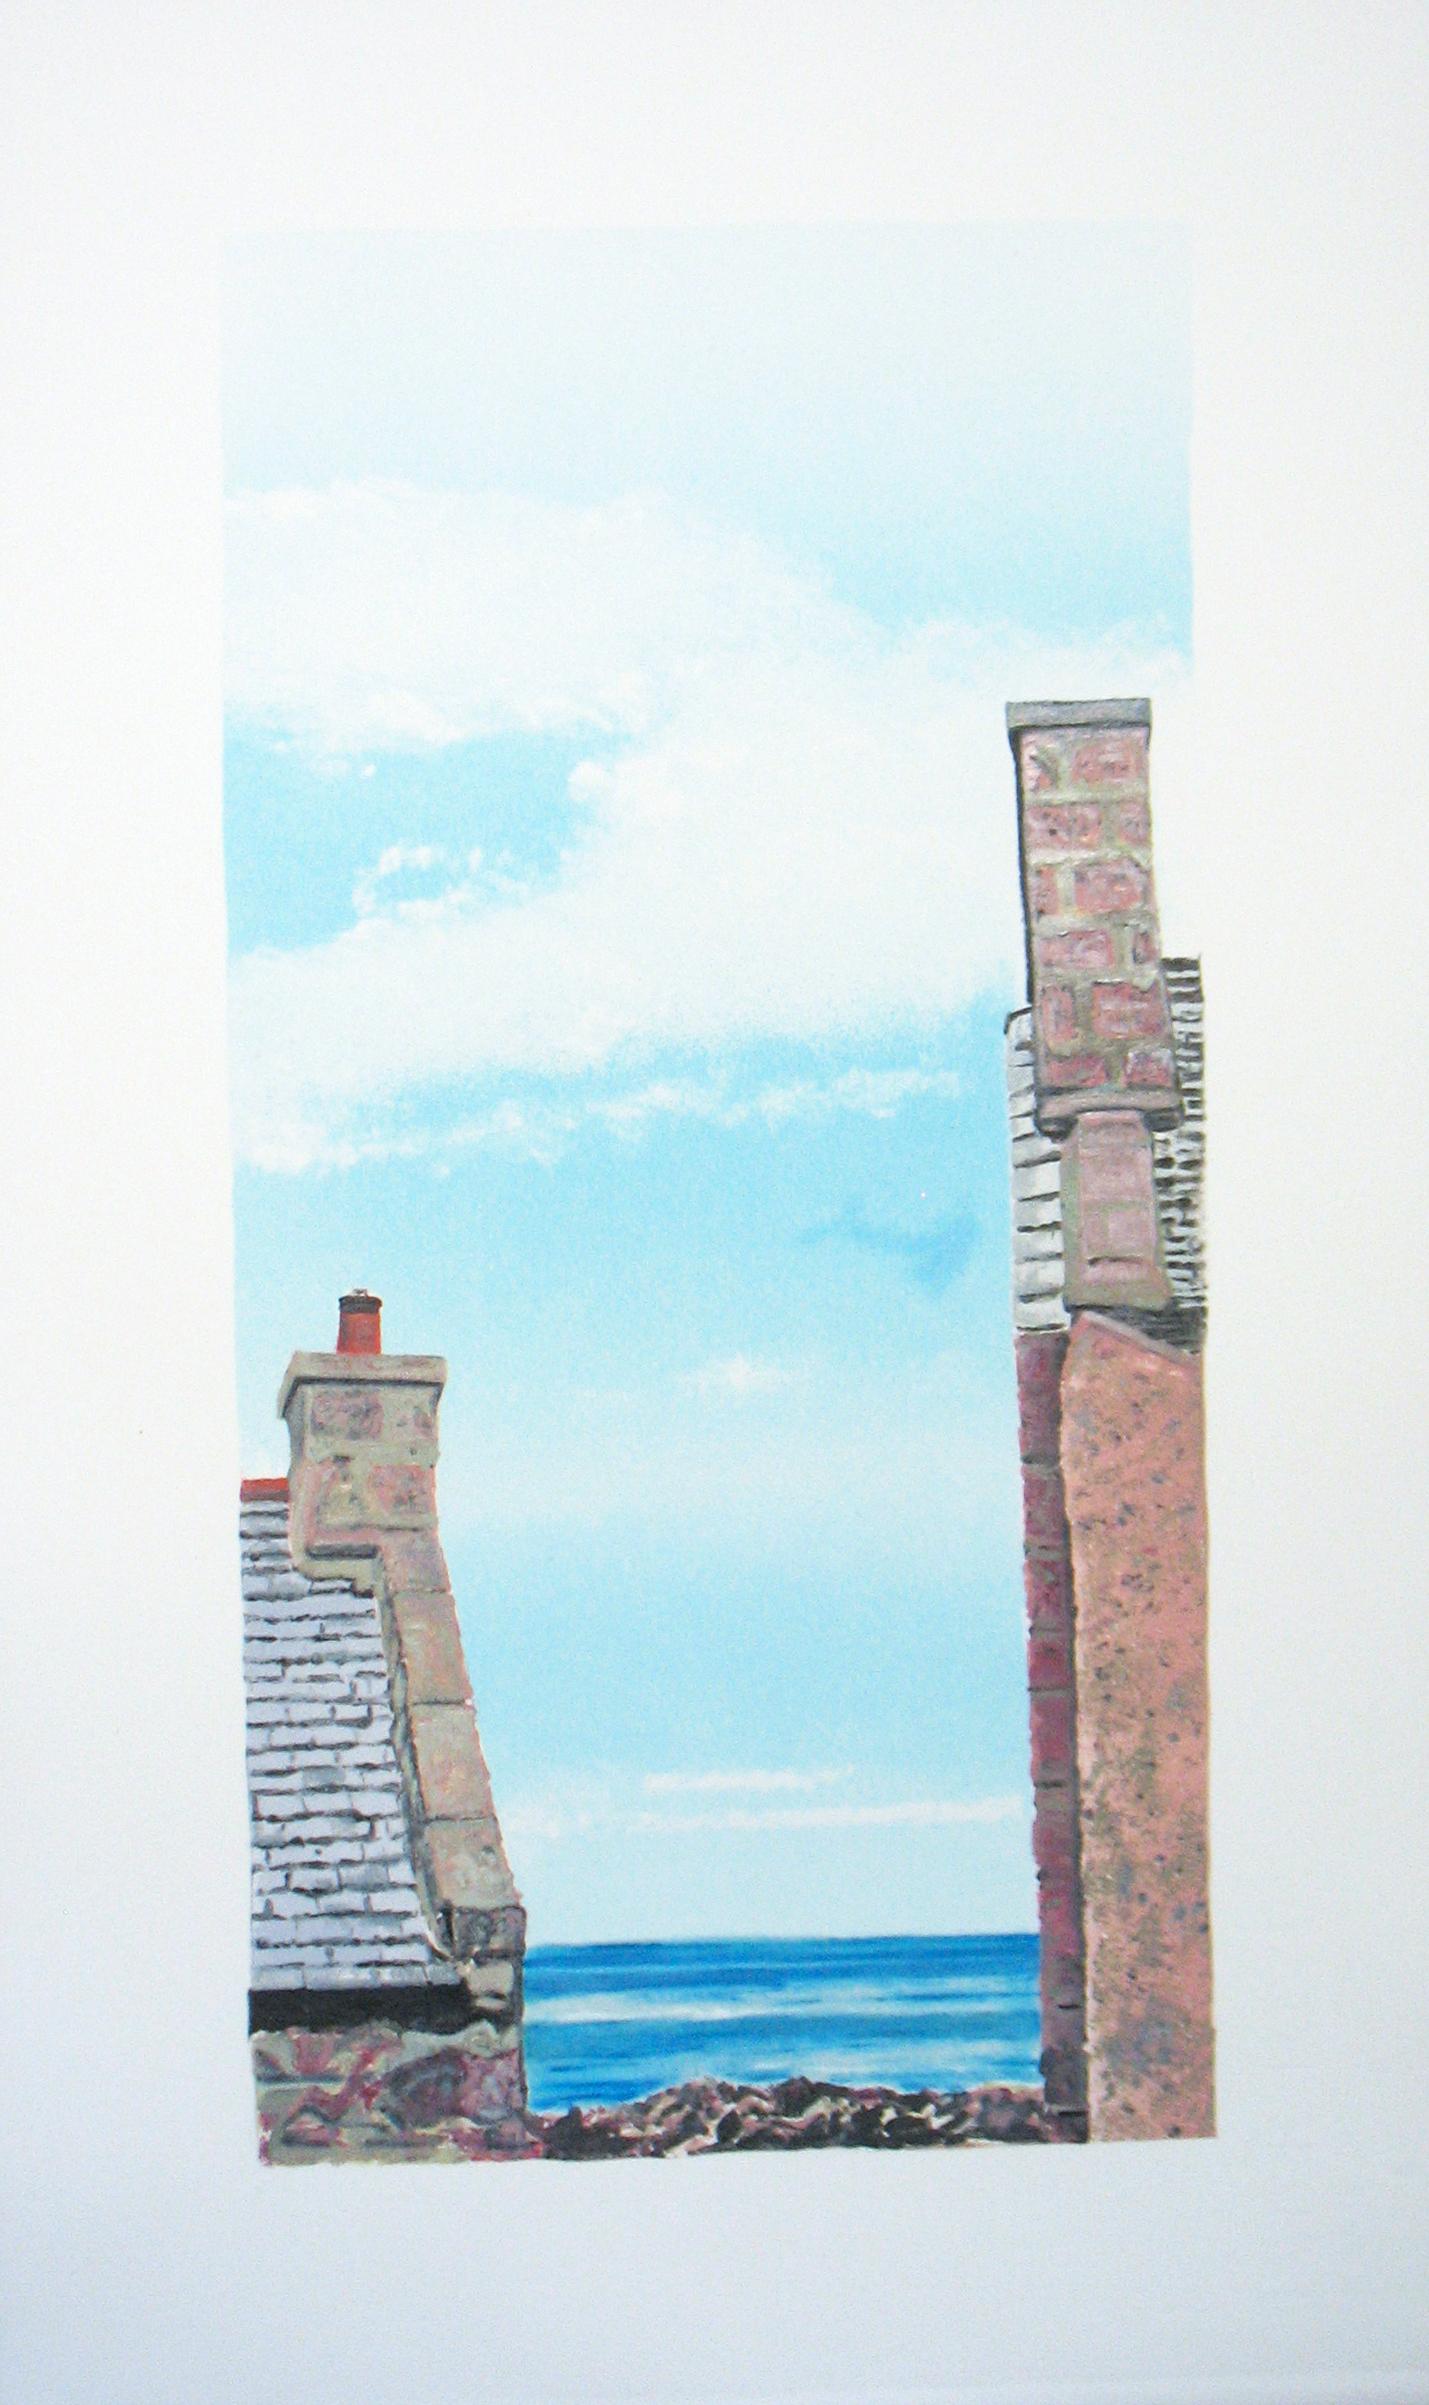 07 Roanheads Chimneys #7